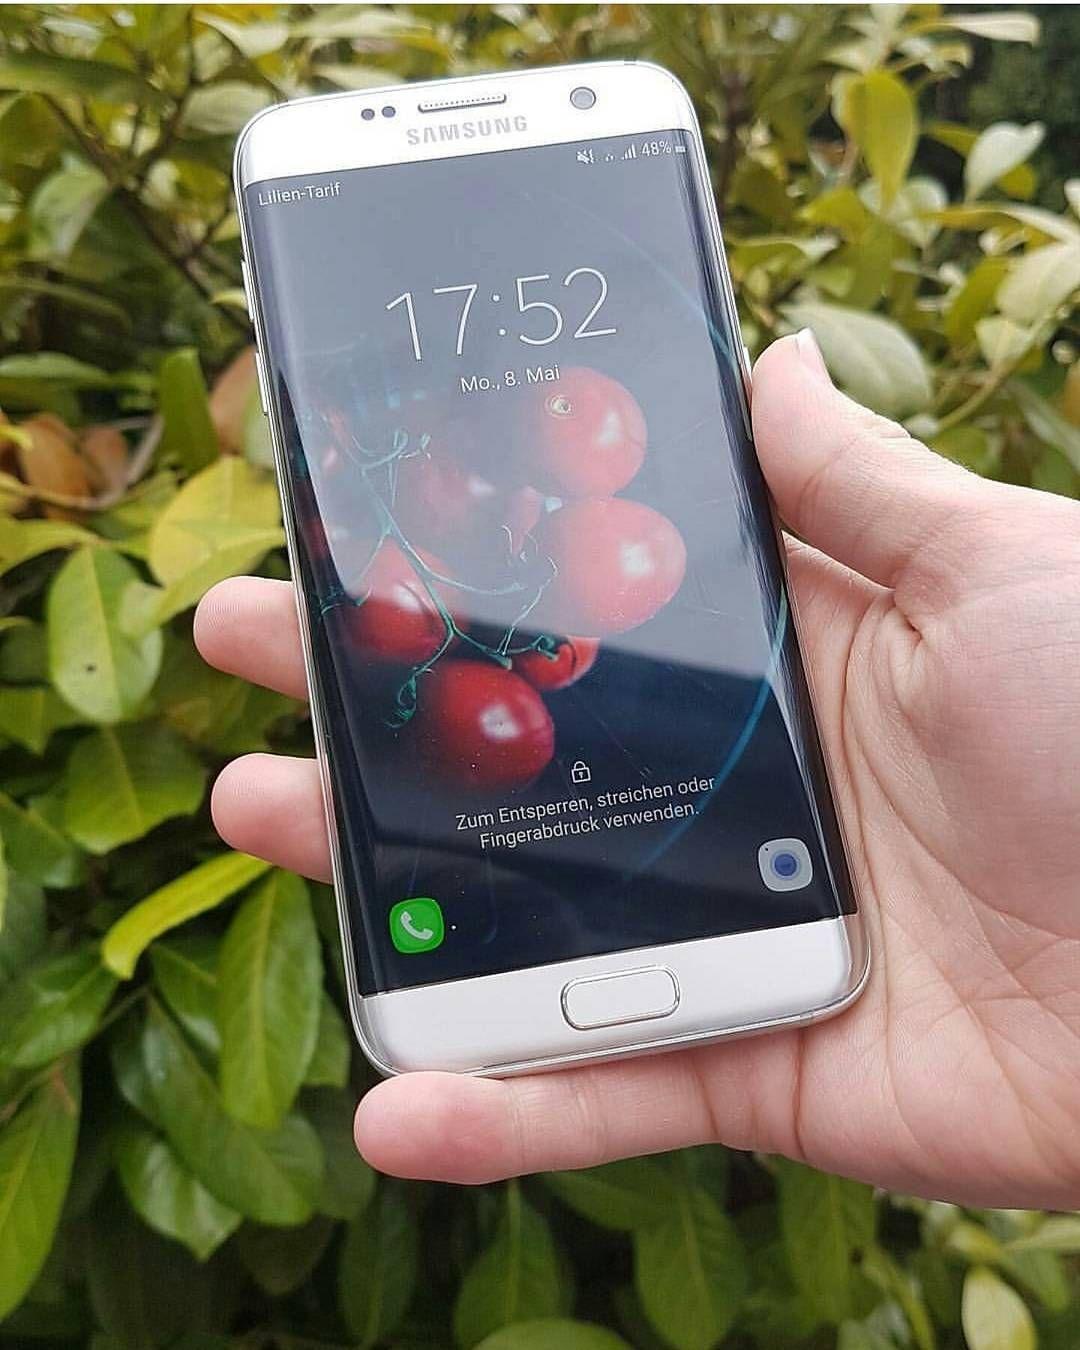 Samsung Galaxy S7 Edge Samsung Pics Samsungblog Samsung Galaxy Samsunggalaxy Galaxys8 Phone Case Accessories Blackberry Phone Latest Phones